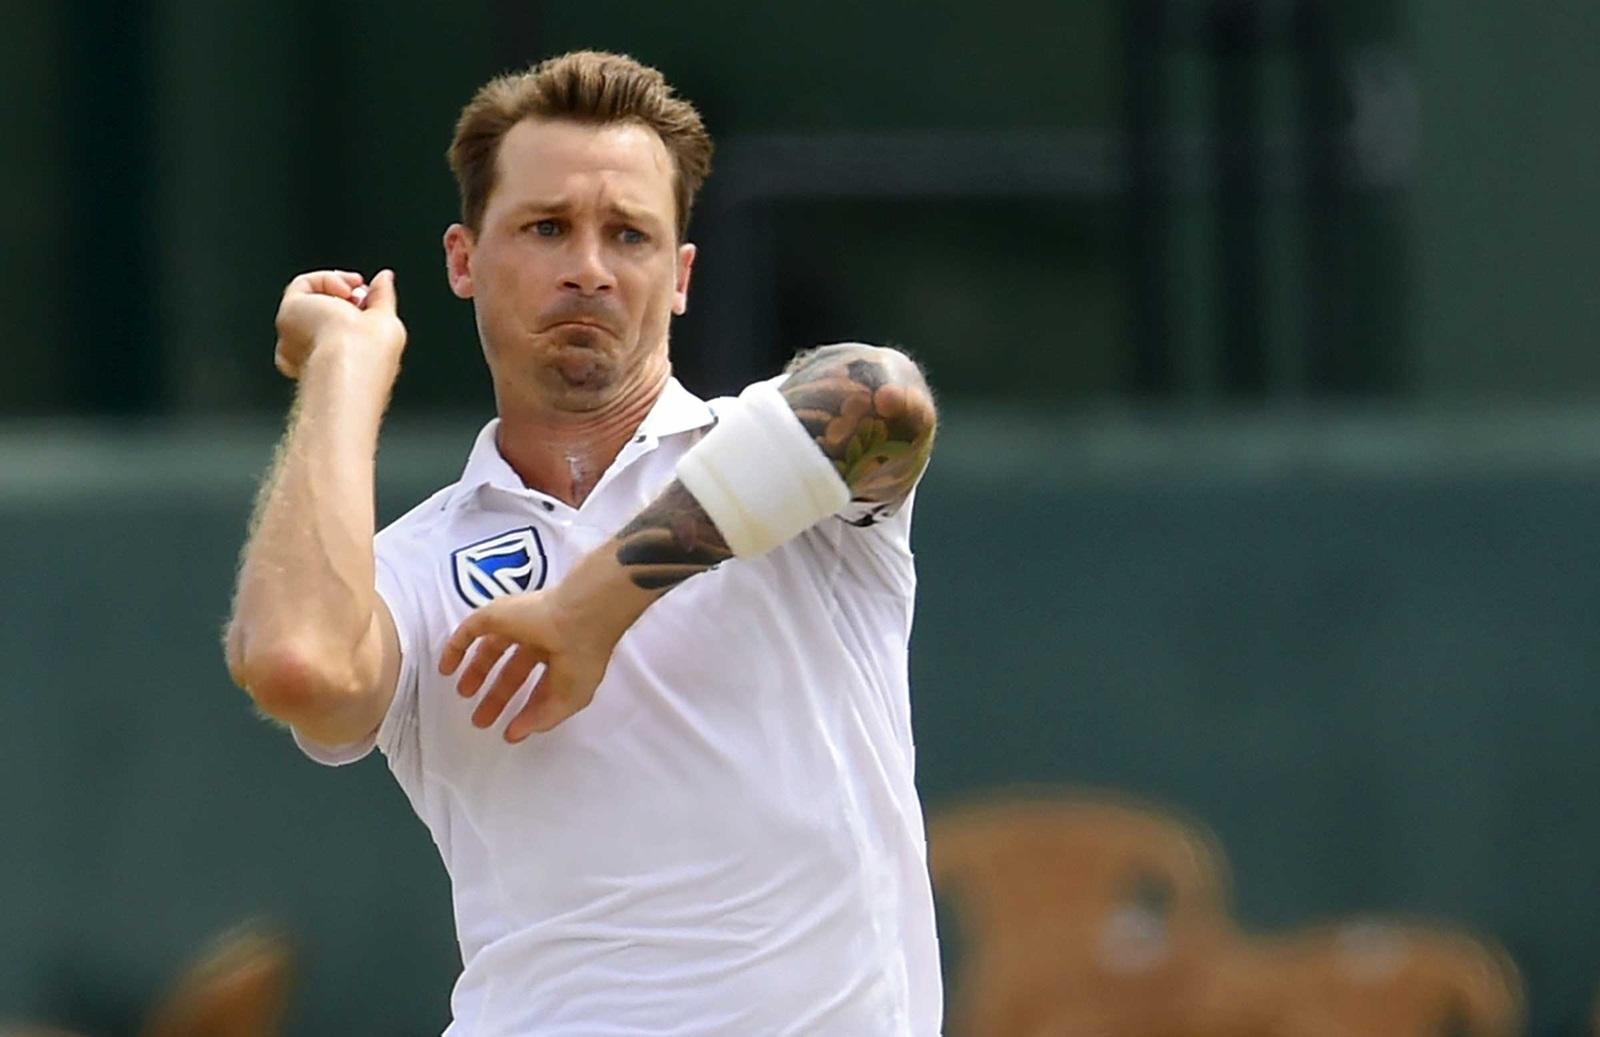 Healthy Steyn targets 500 Test wickets | cricket.com.au